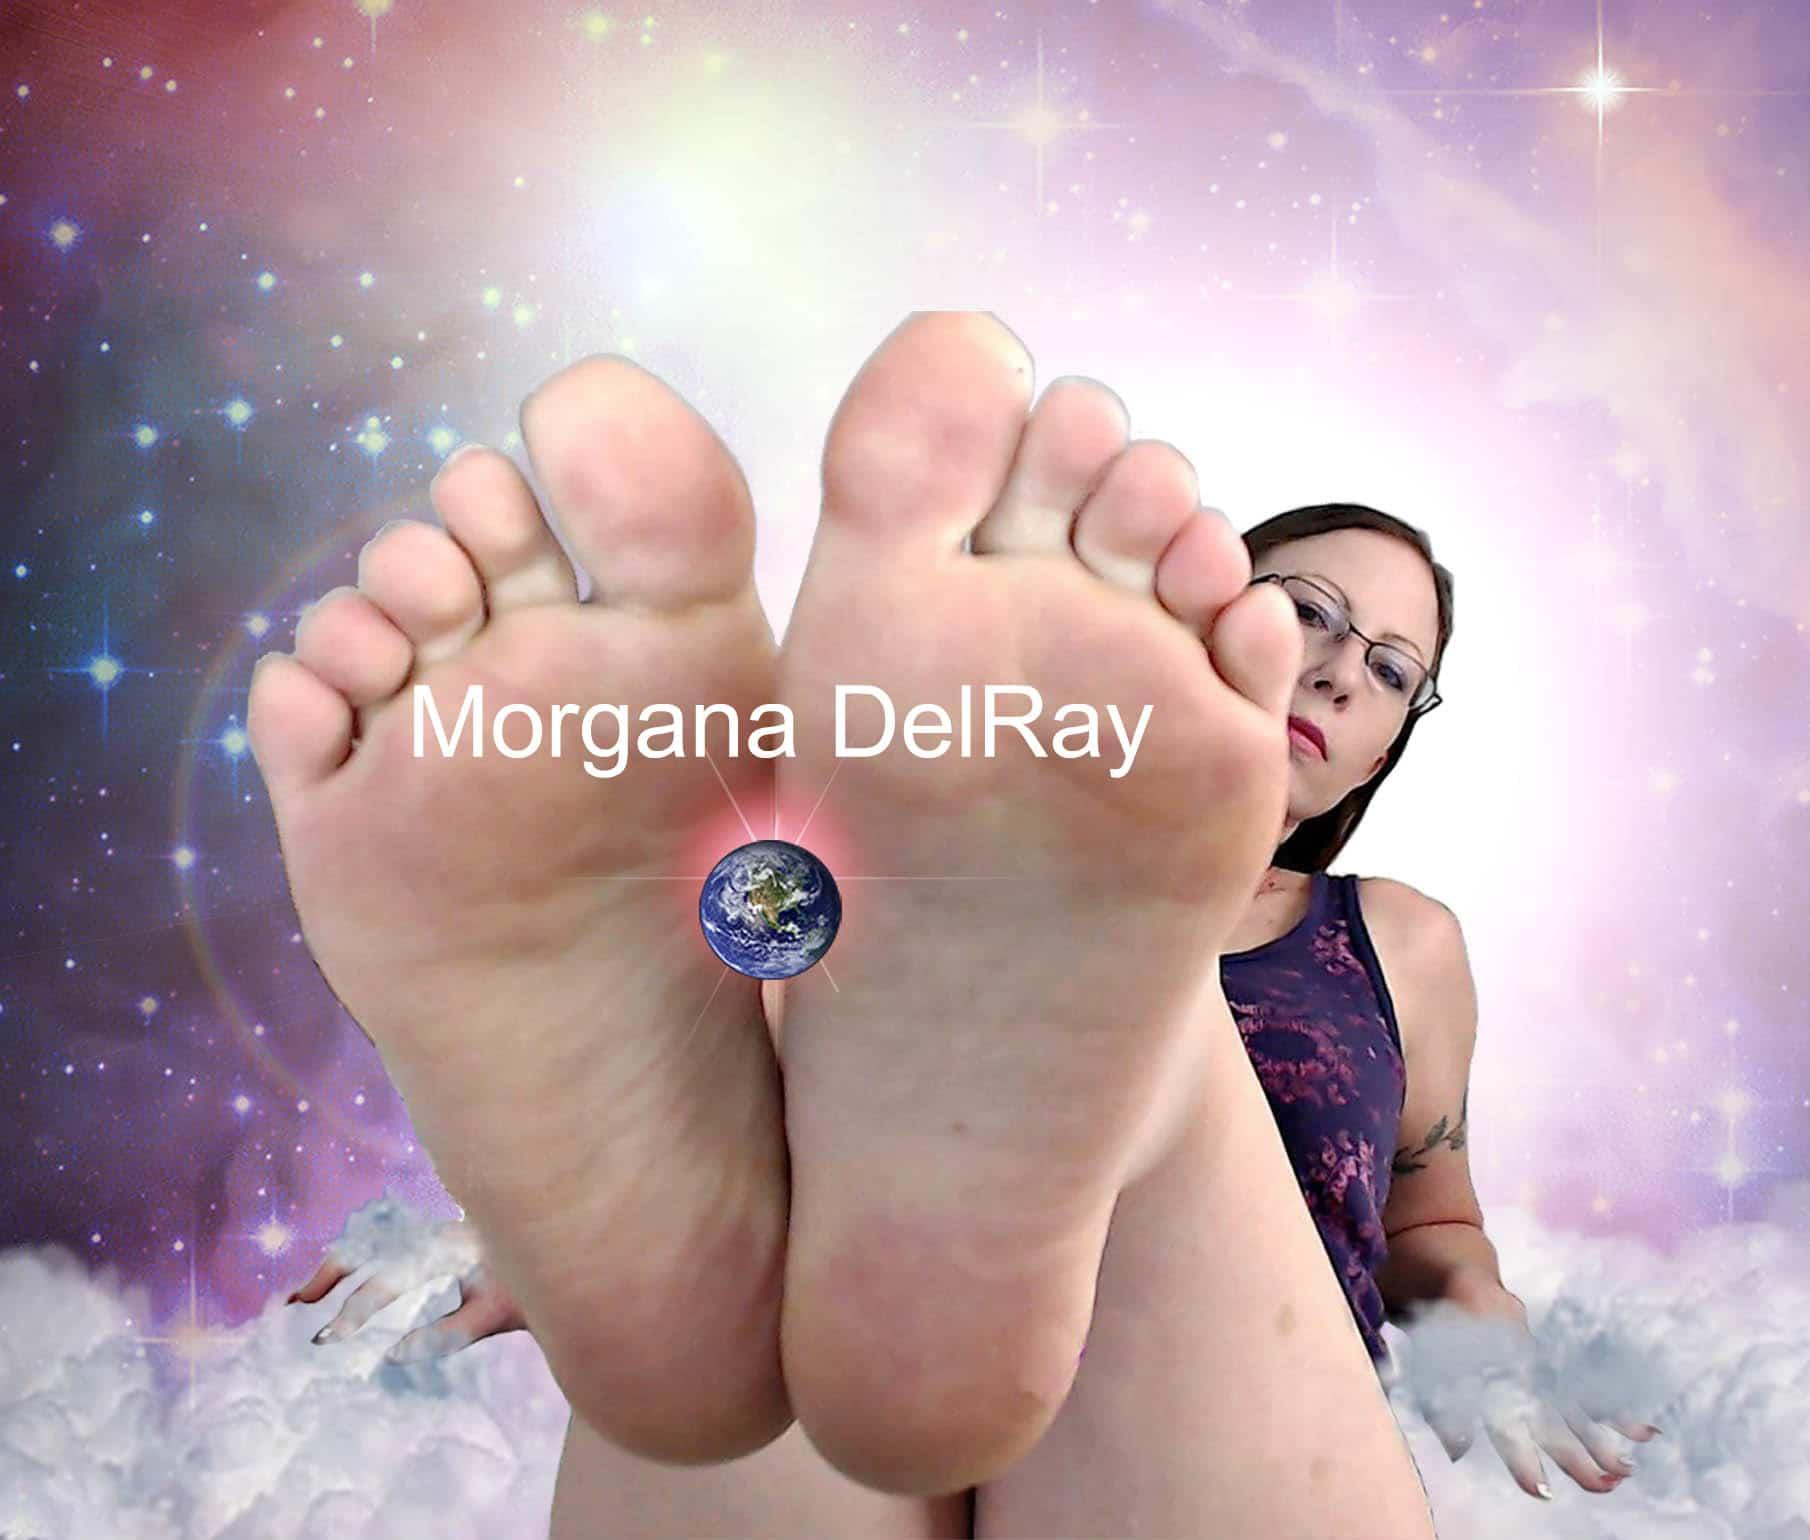 MorganaDelRay